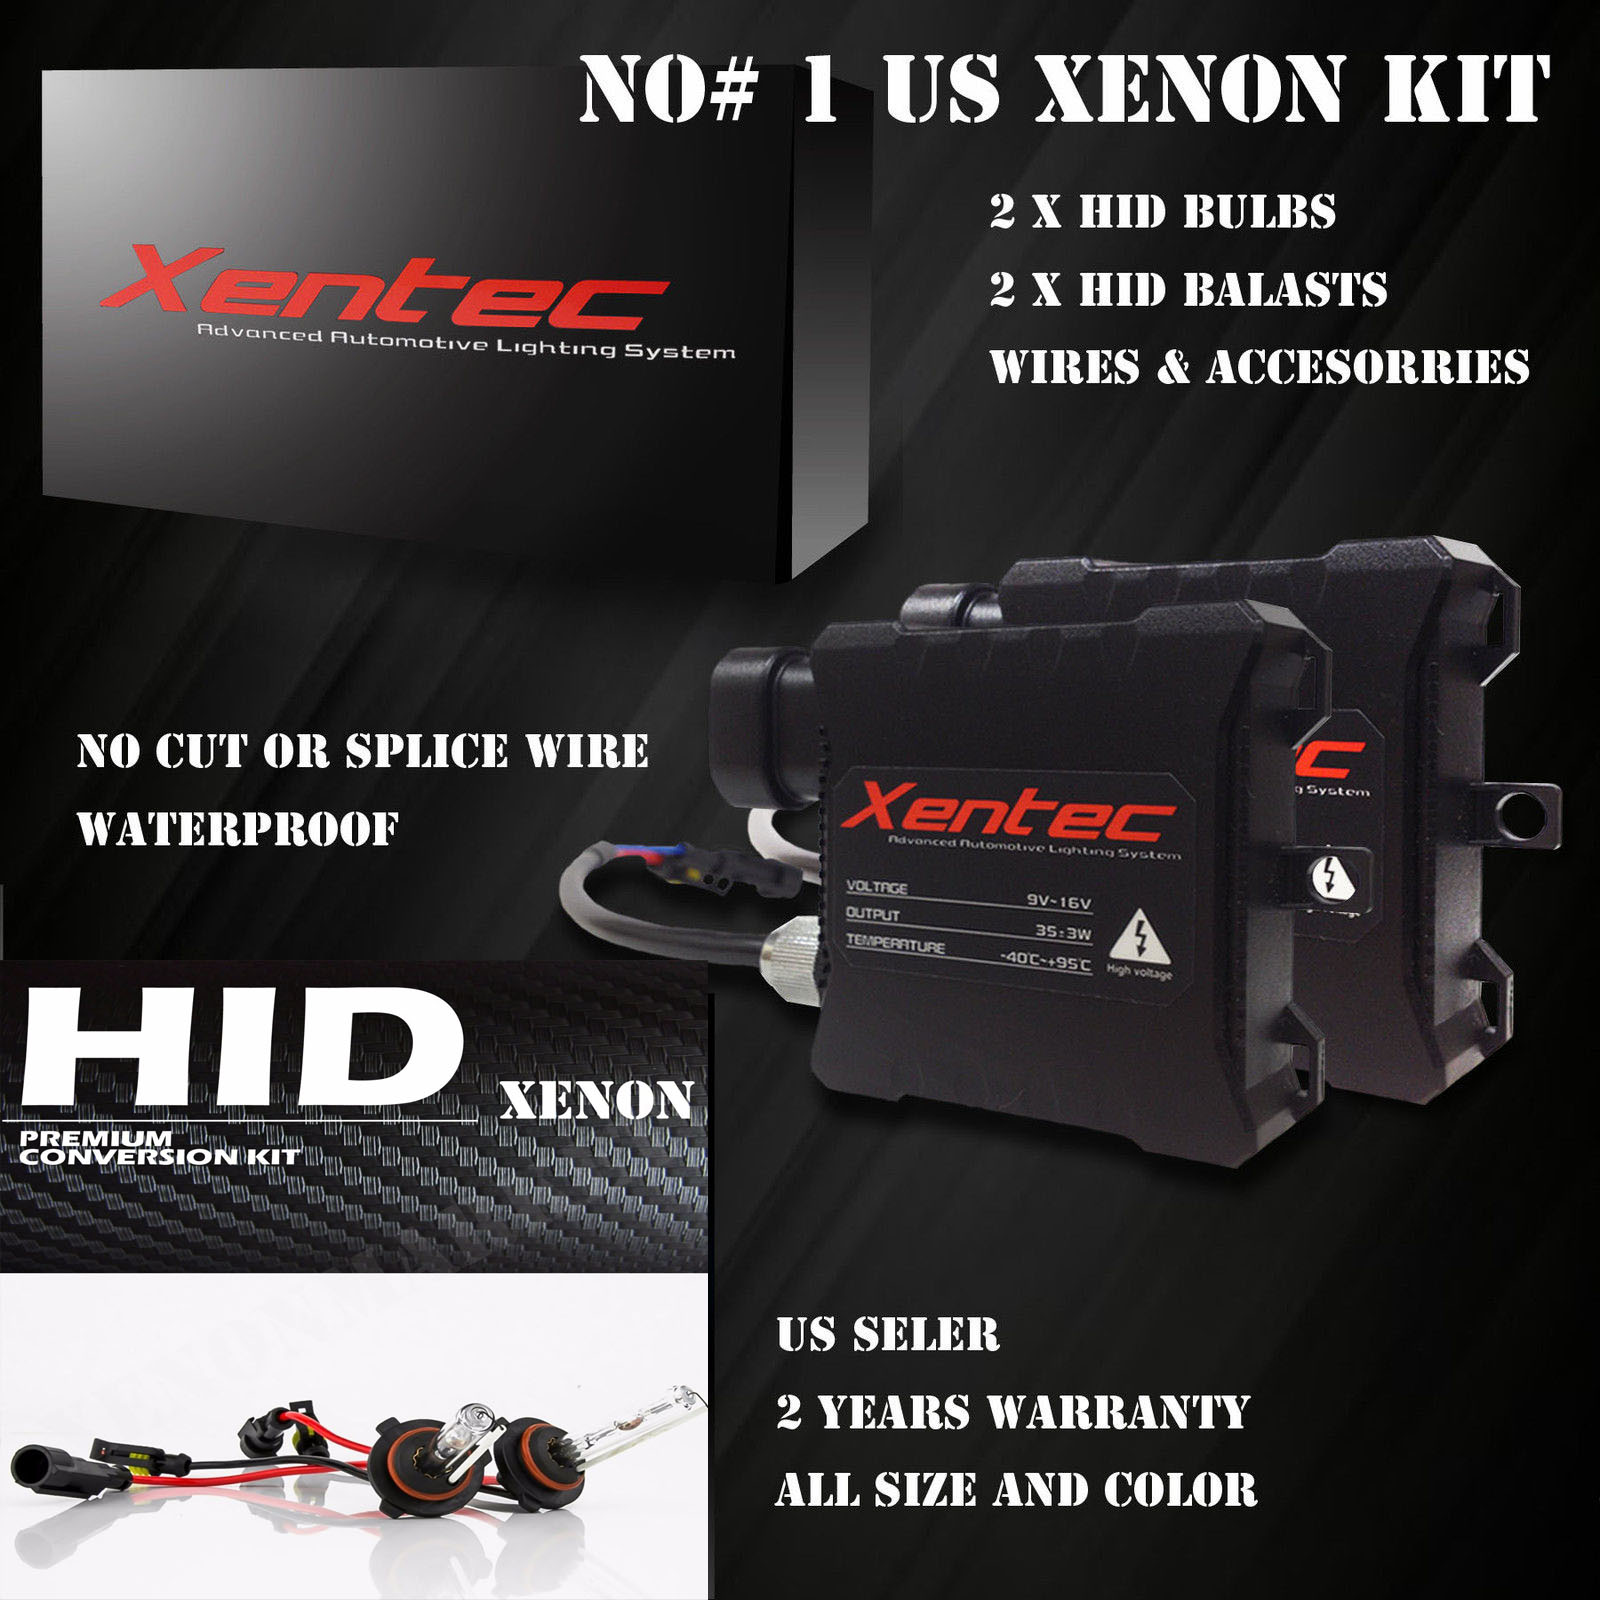 Hid Kit For Nissan Titan Versa Xterra Altima Maxima Sentra